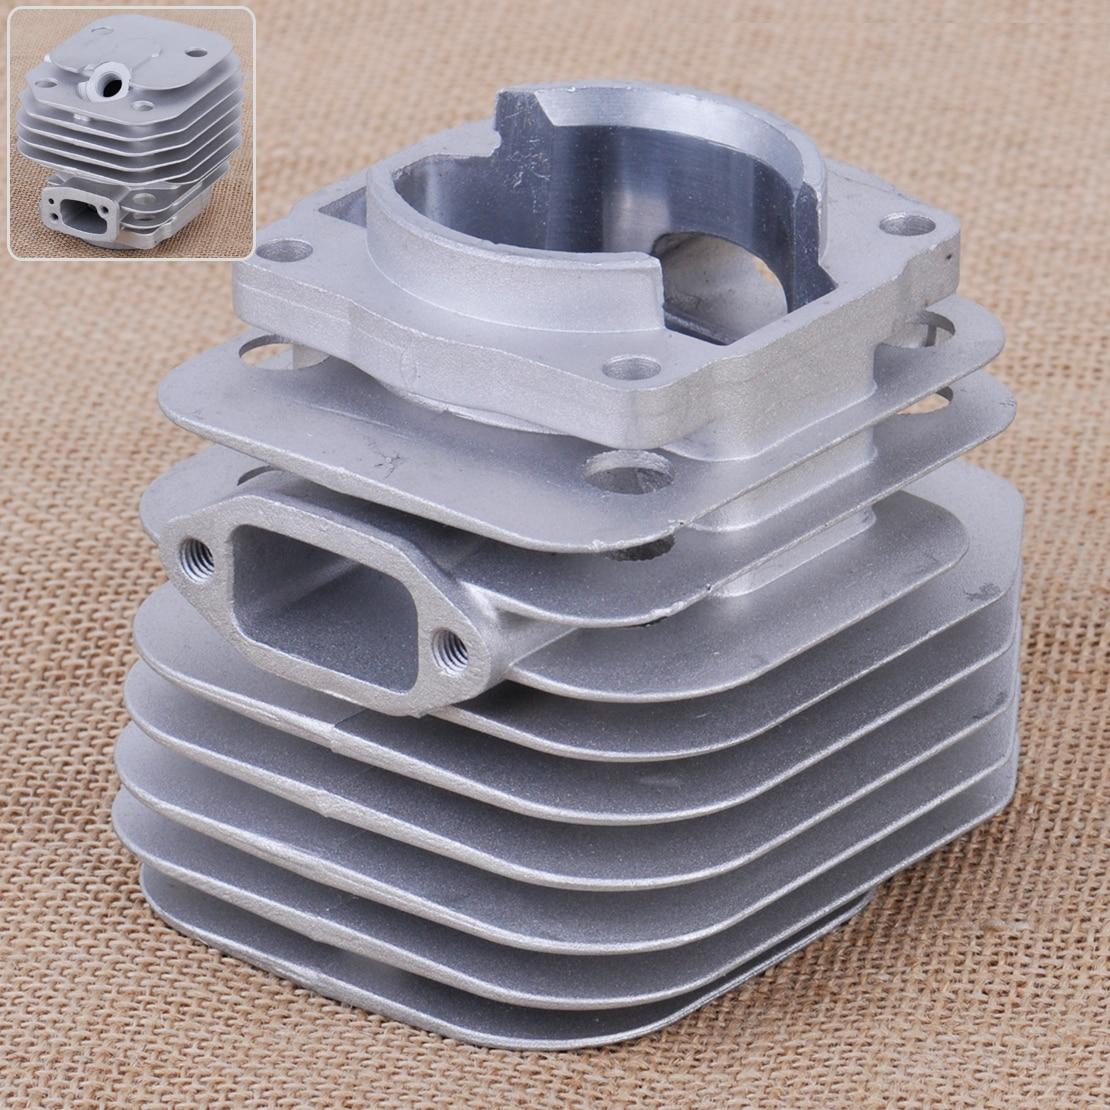 где купить LETAOSK New 50mm Piston Rings Assembly Kit 503691271 fit for Husqvarna 371 372 371XP 372XP Chainsaw по лучшей цене